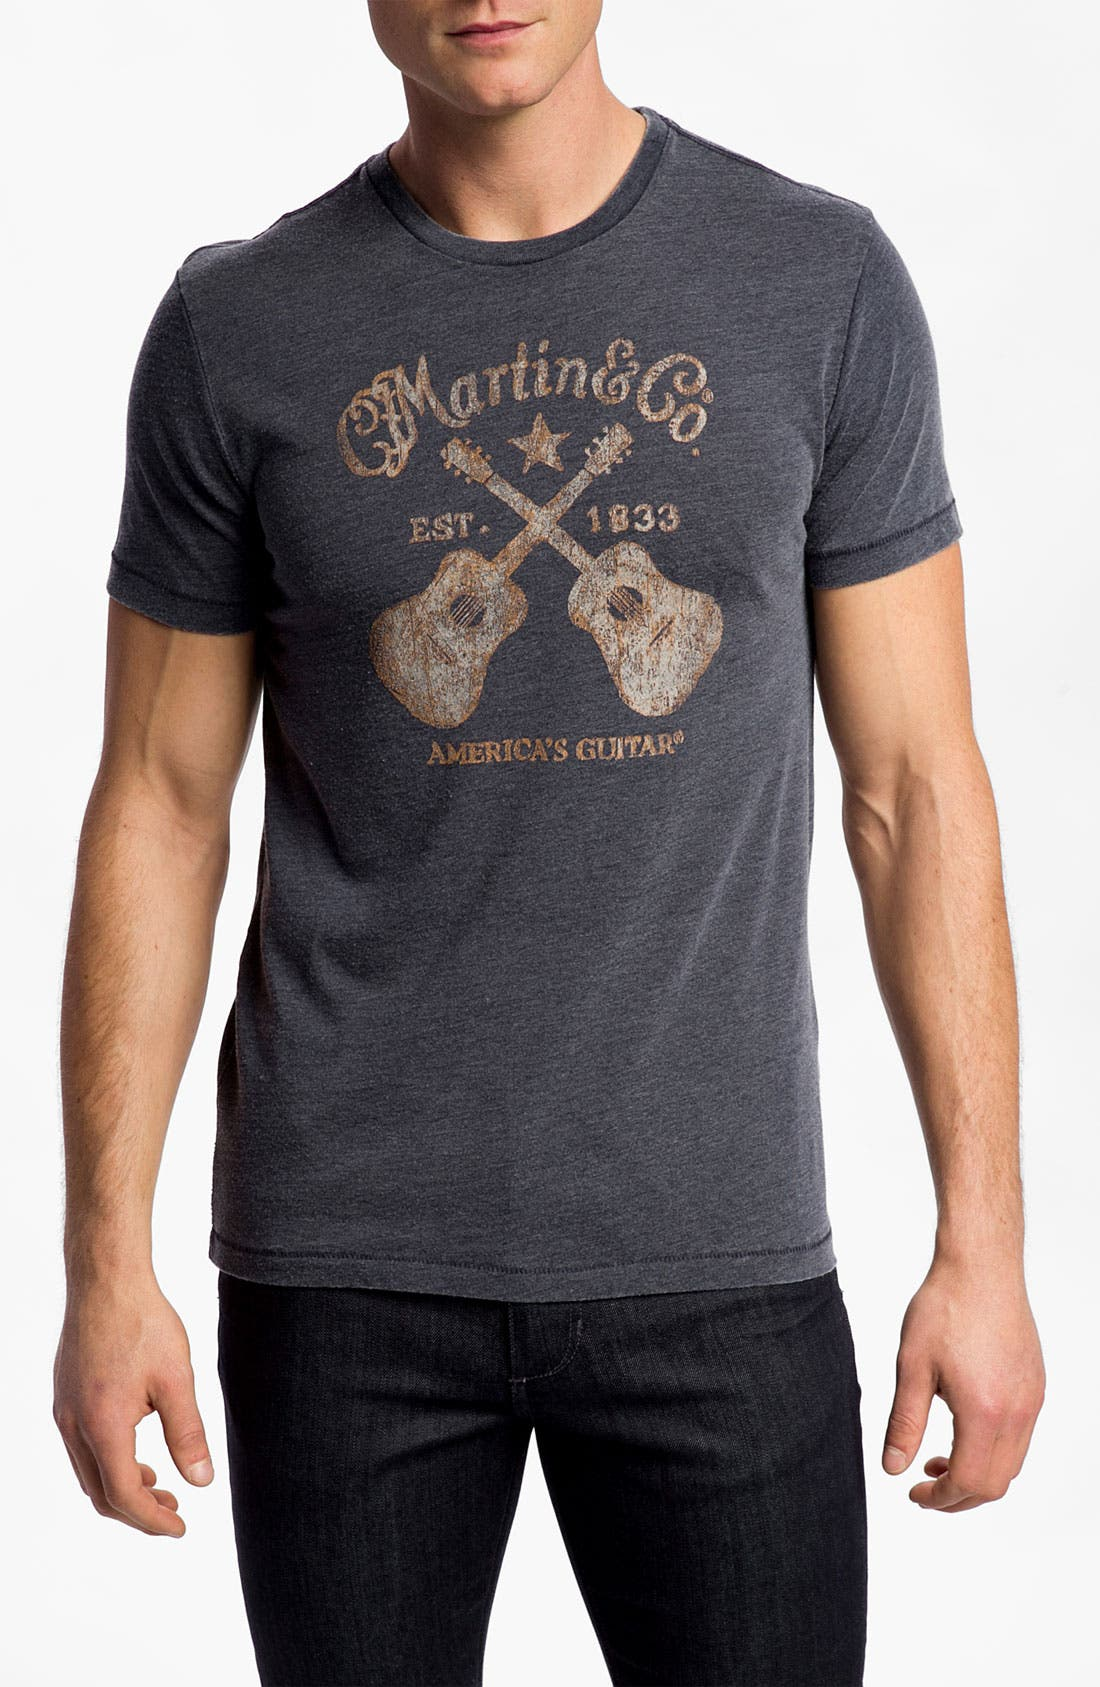 Alternate Image 1 Selected - Lucky Brand 'Martin Guitars' T-Shirt